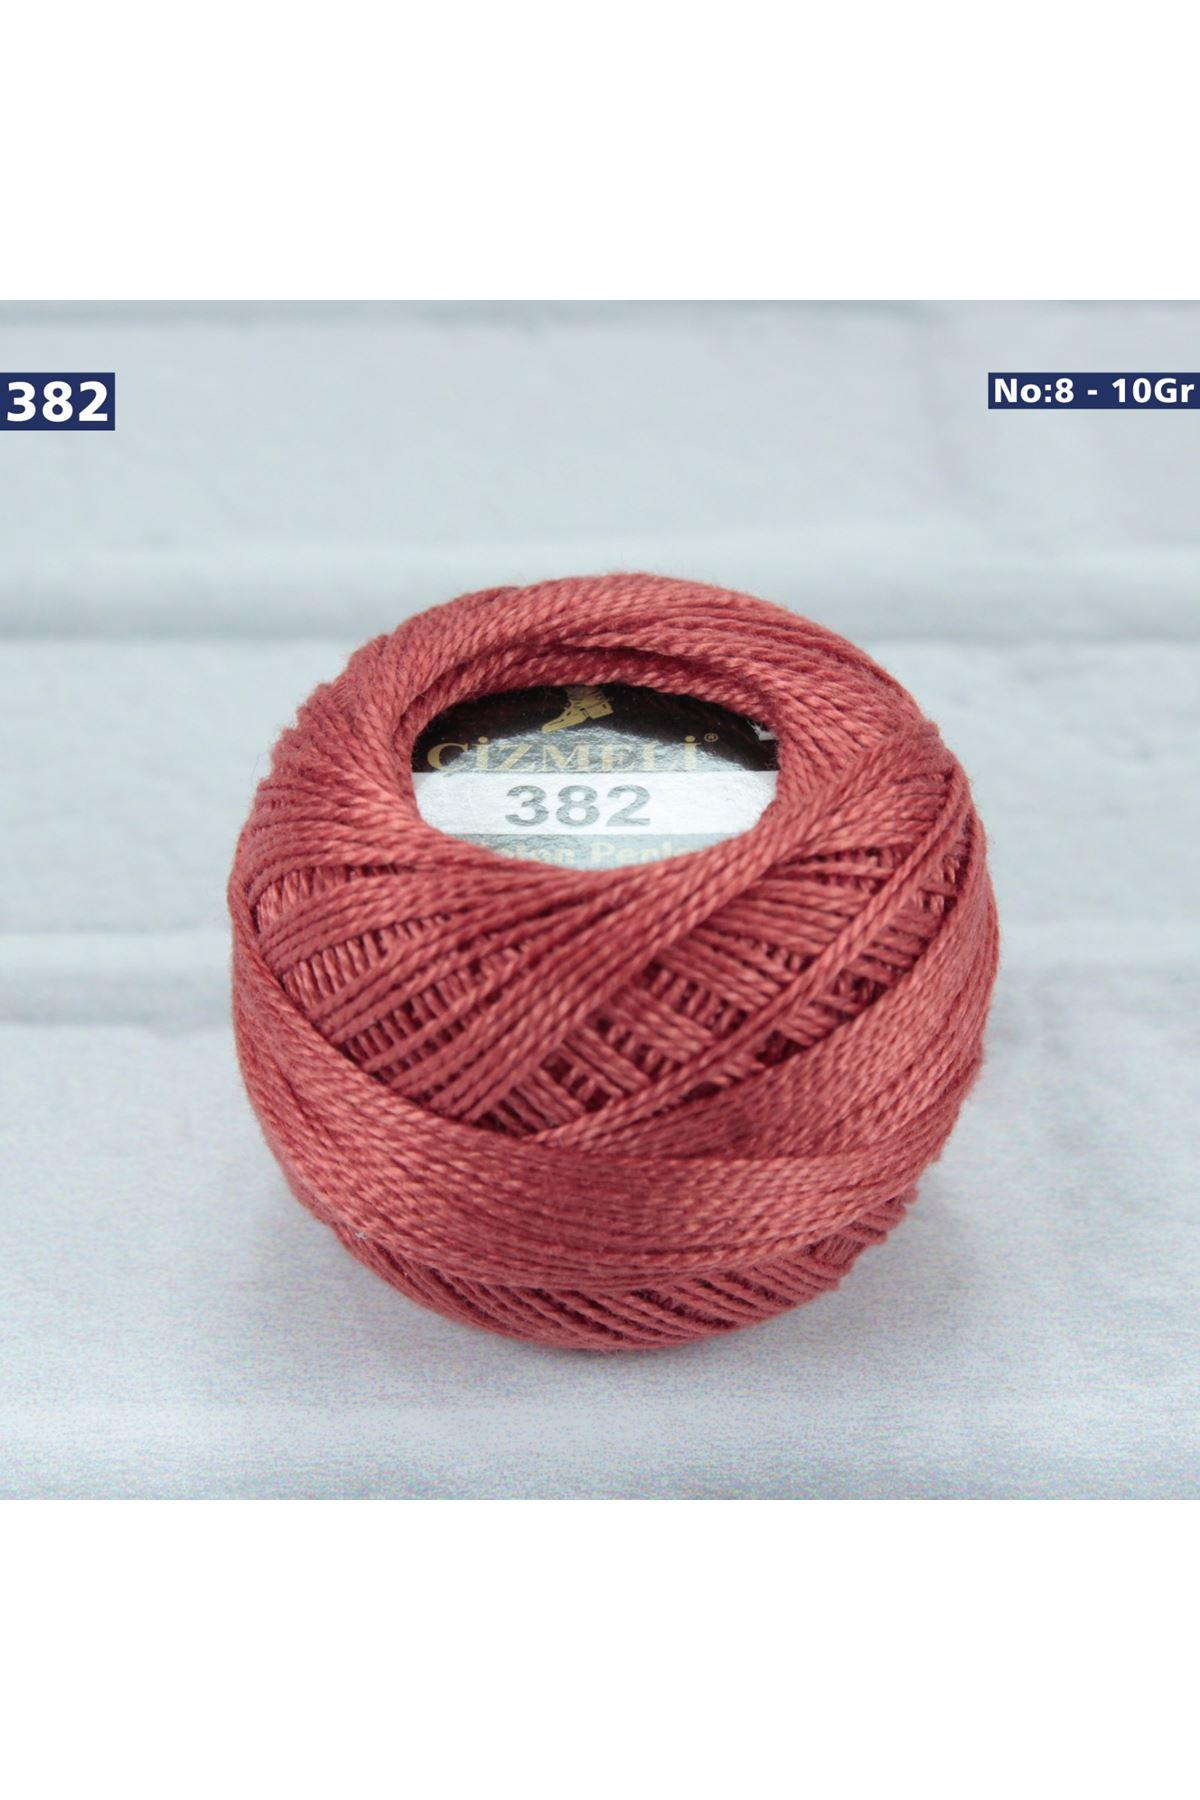 Çizmeli Cotton Perle Nakış İpliği No: 382